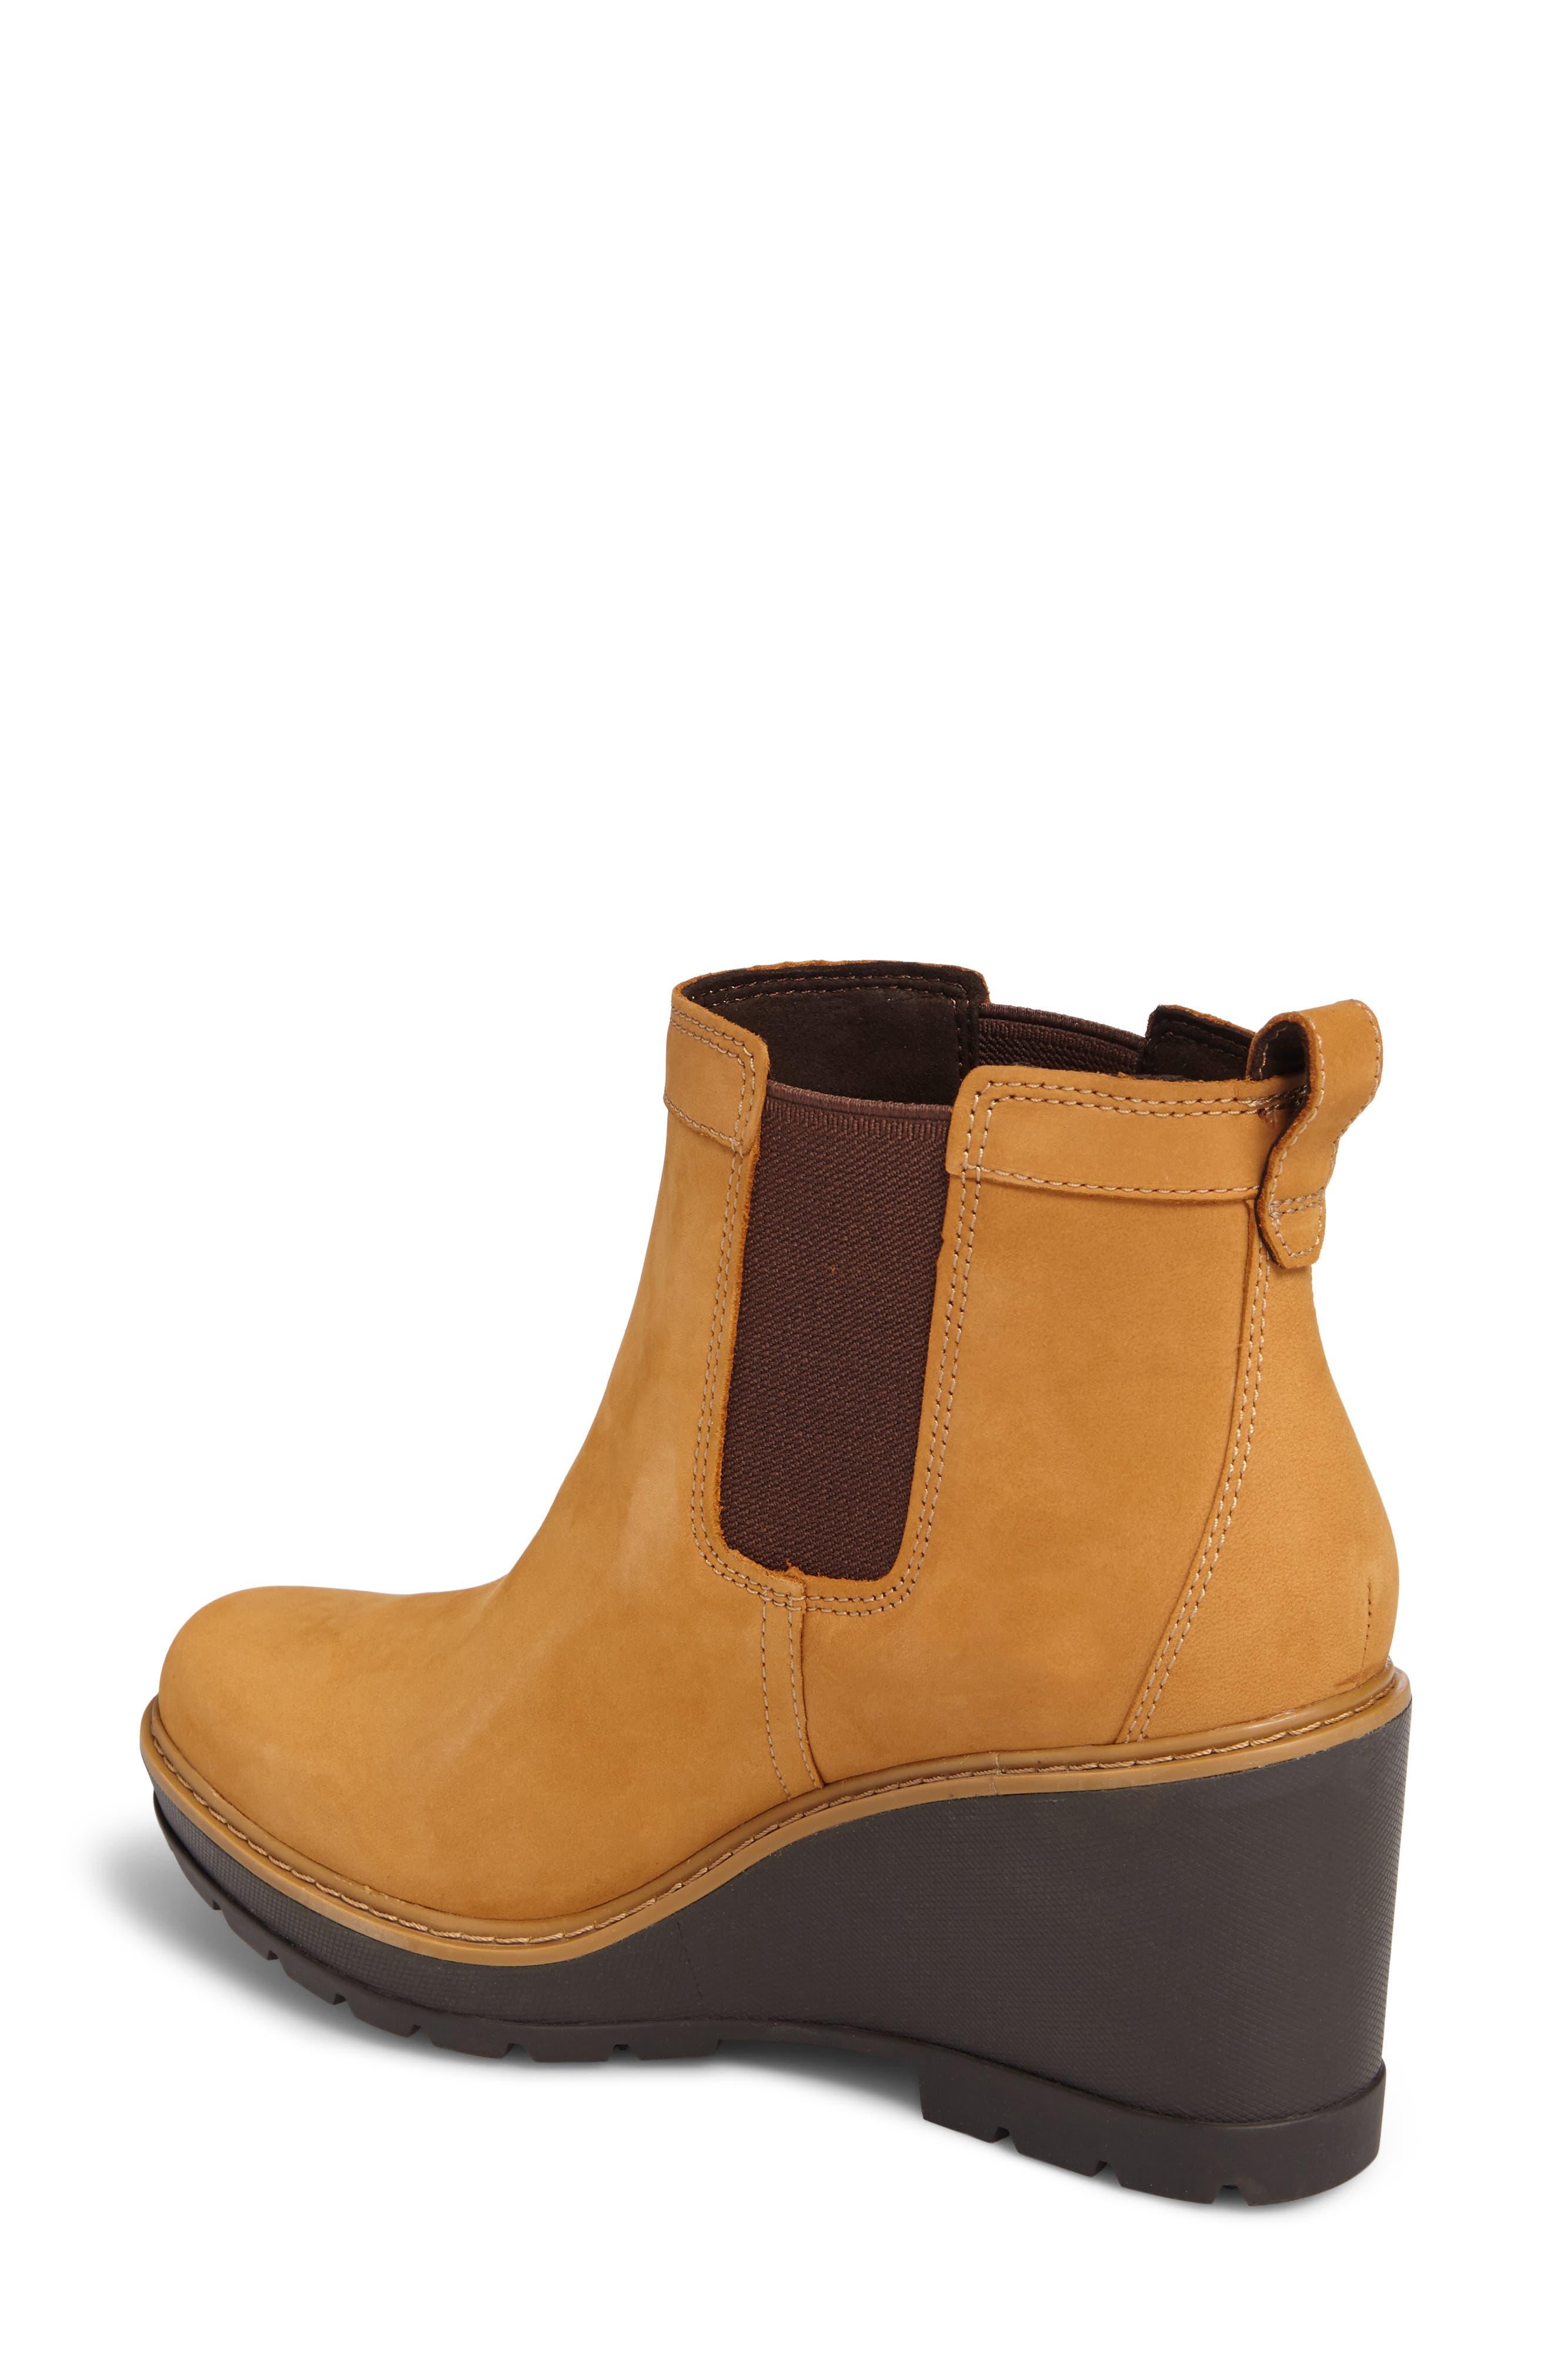 Kellis Water Resistant Chelsea Wedge Boot,                             Alternate thumbnail 2, color,                             Wheat Nubuck